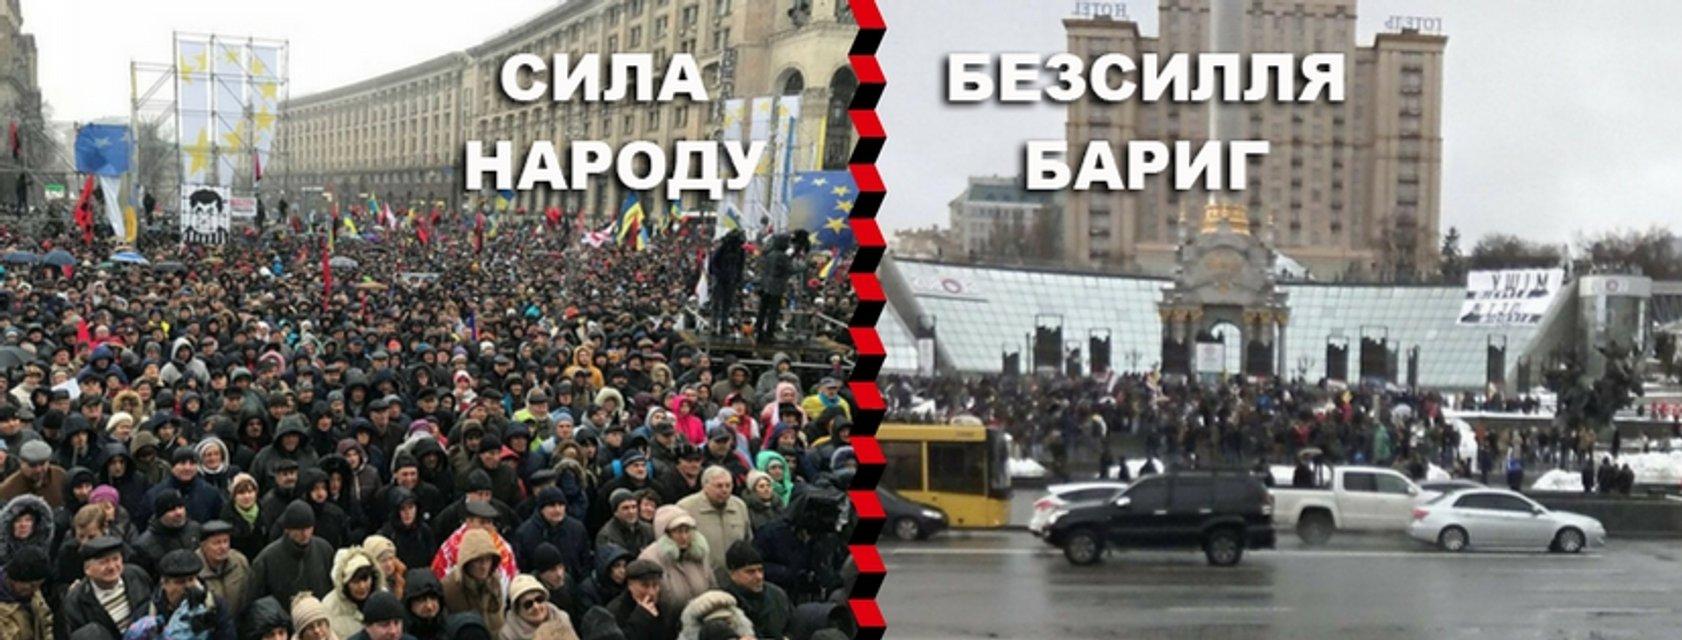 Саакашвили назвал участников акции 'Кофе на Кещатике' барыгами - фото 99100